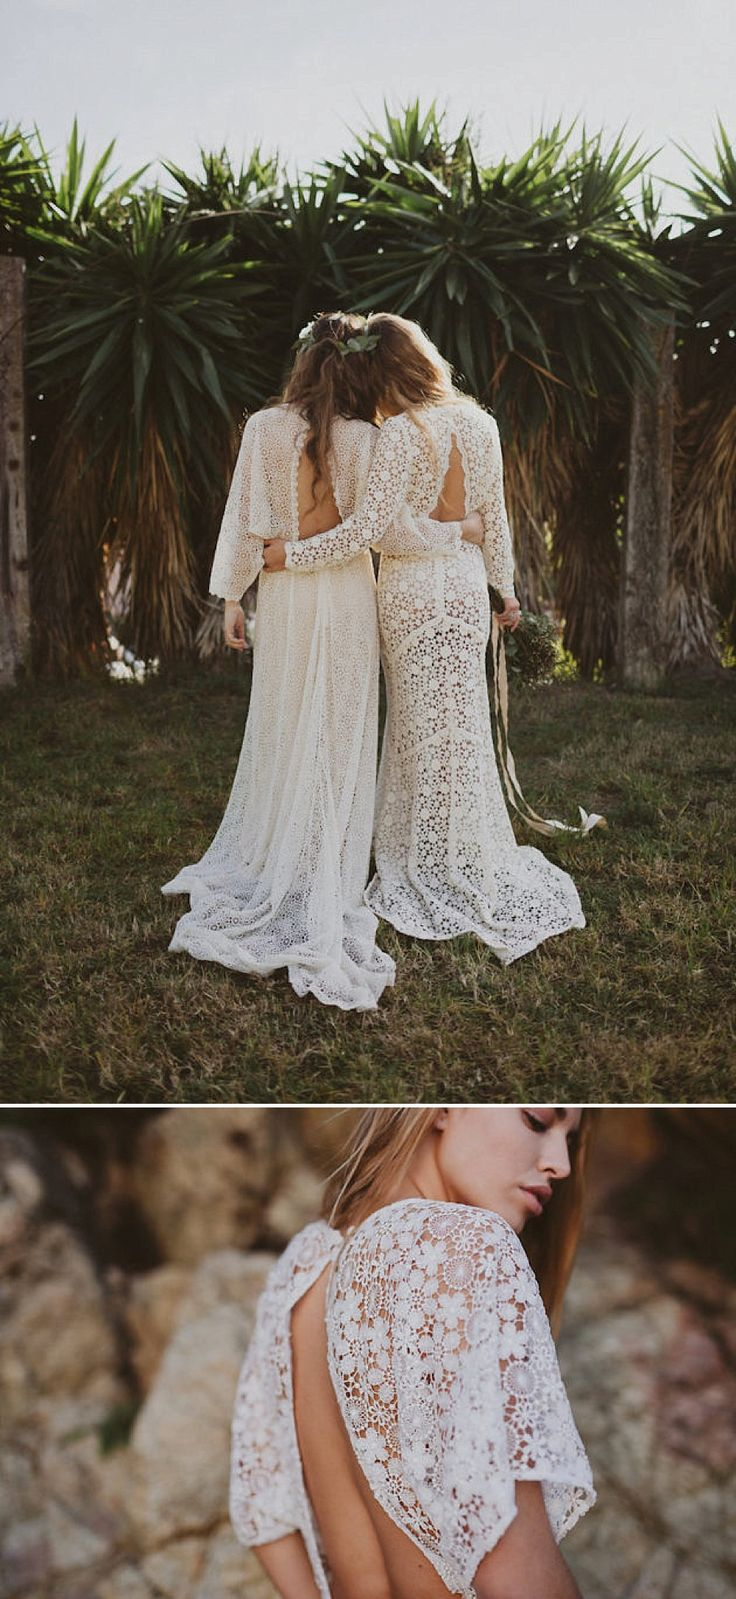 best bridal separates images on pinterest wedding frocks